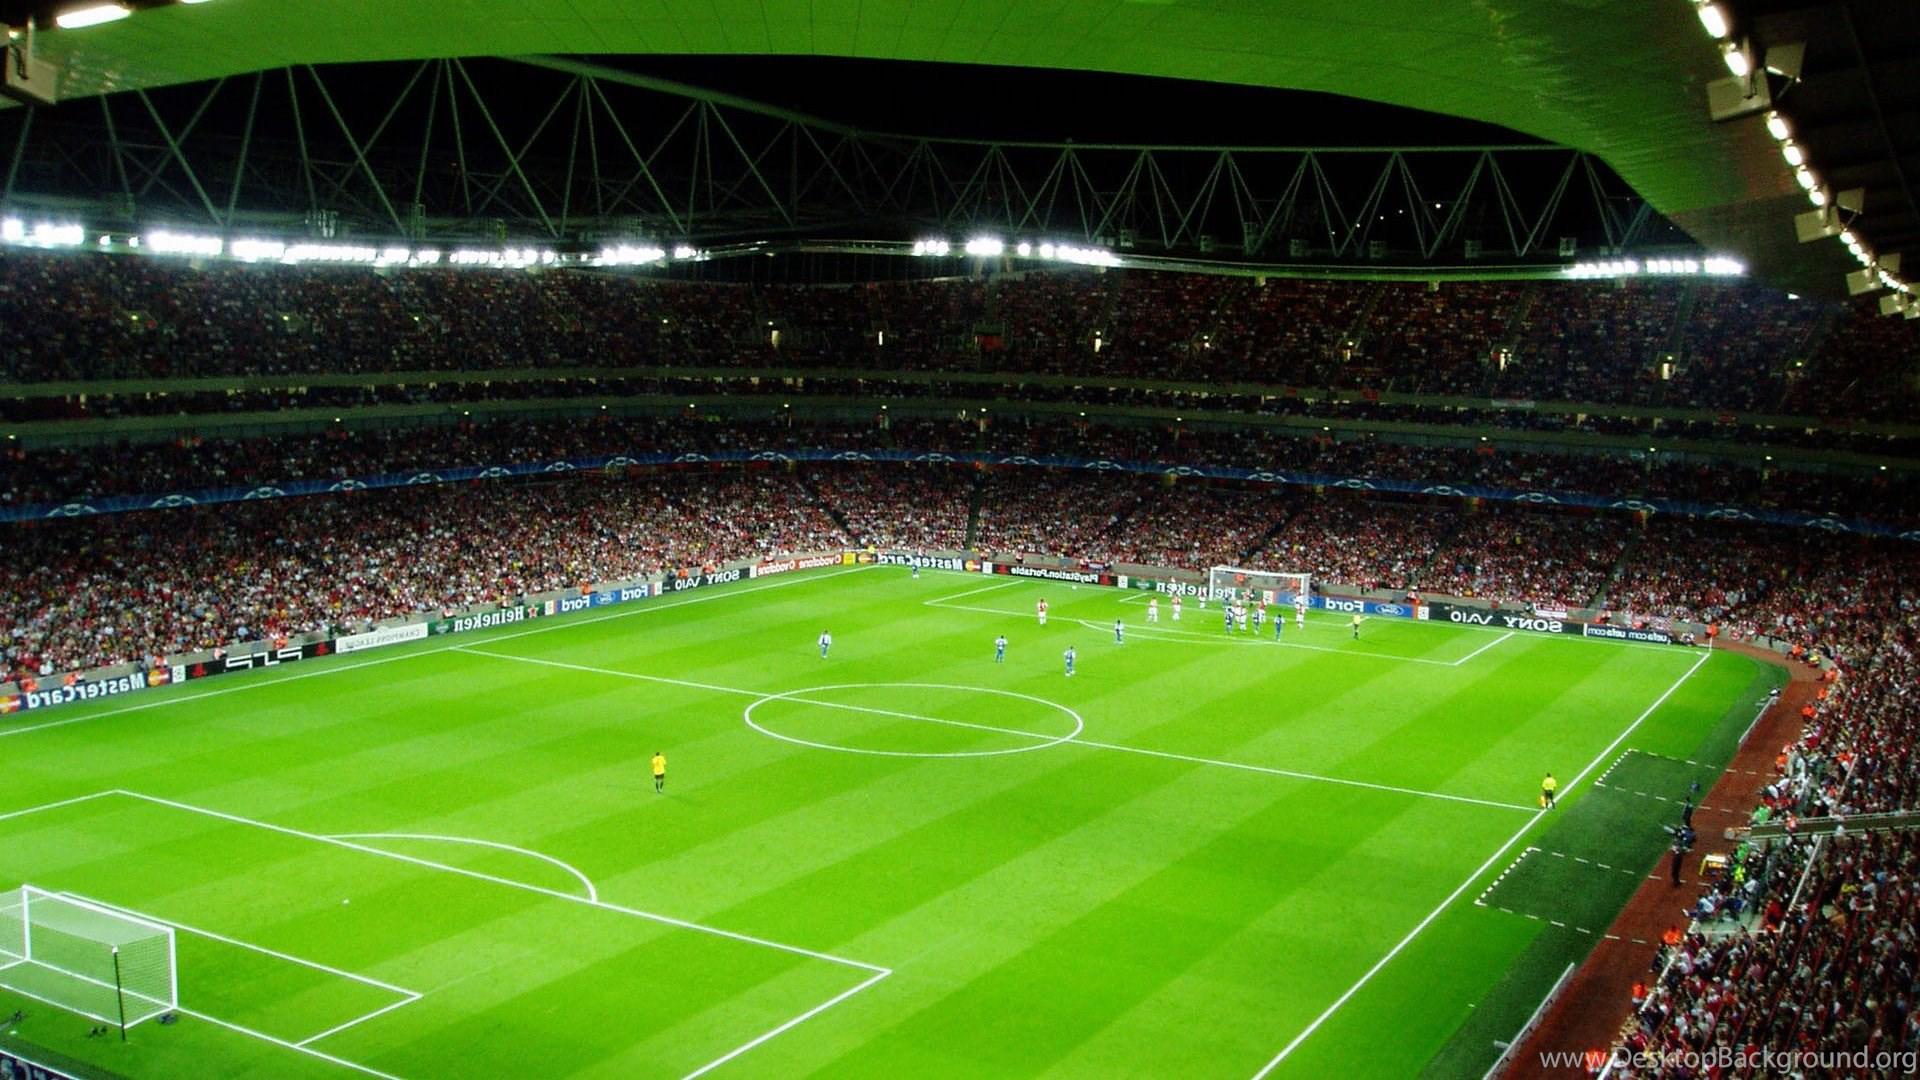 Download Football Ipad Wallpaper Gallery